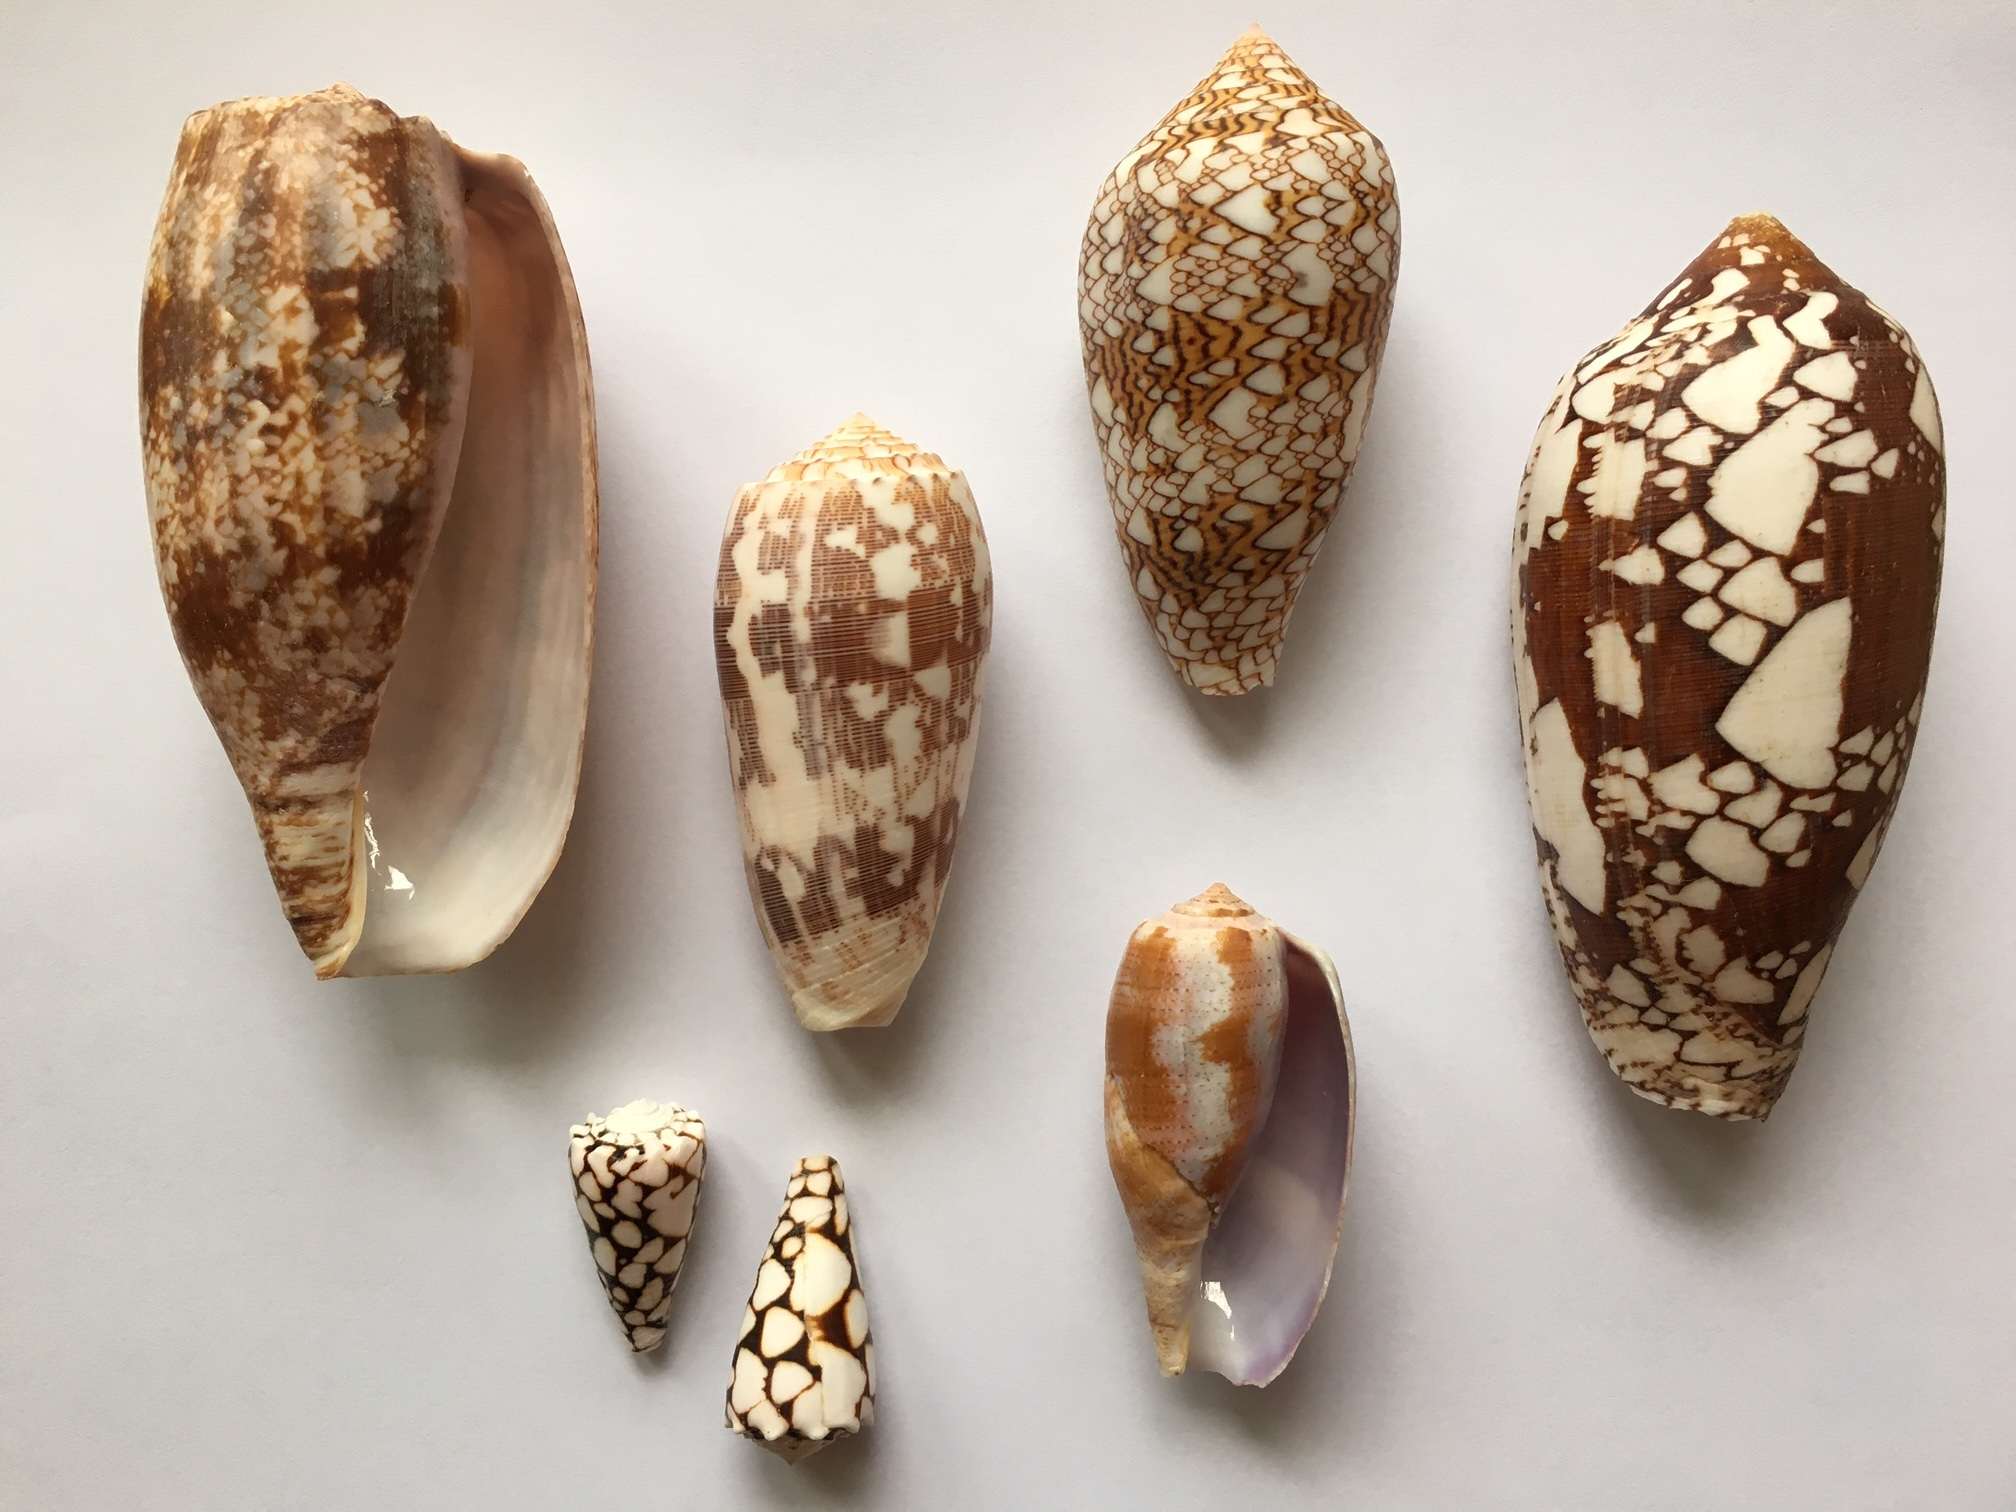 Venomous cones shells of Okinawa